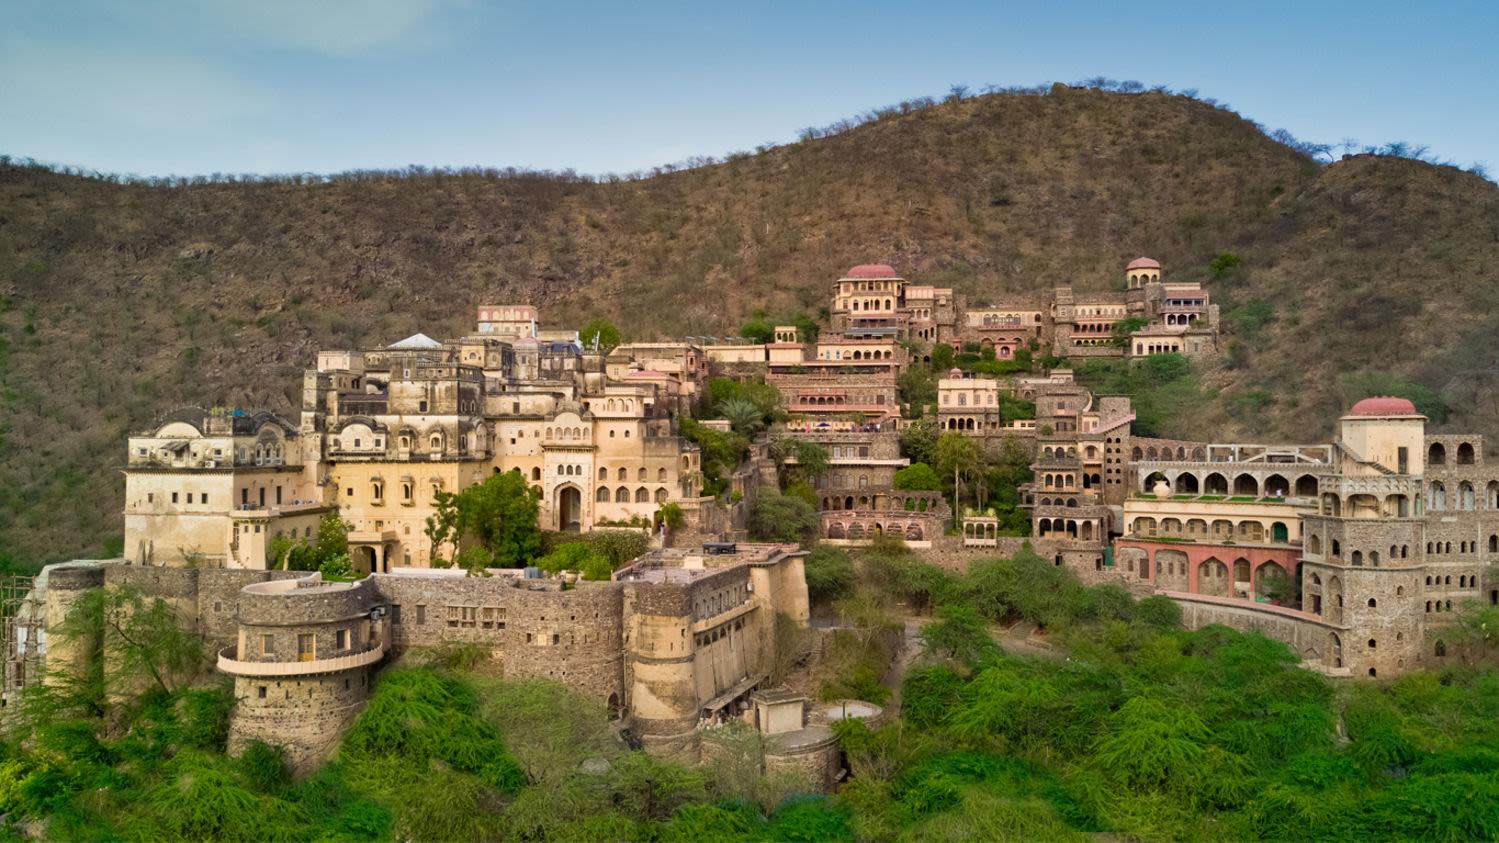 Neemrana Fort-Palace Neemrana Hotels Hotels in India epnnwy